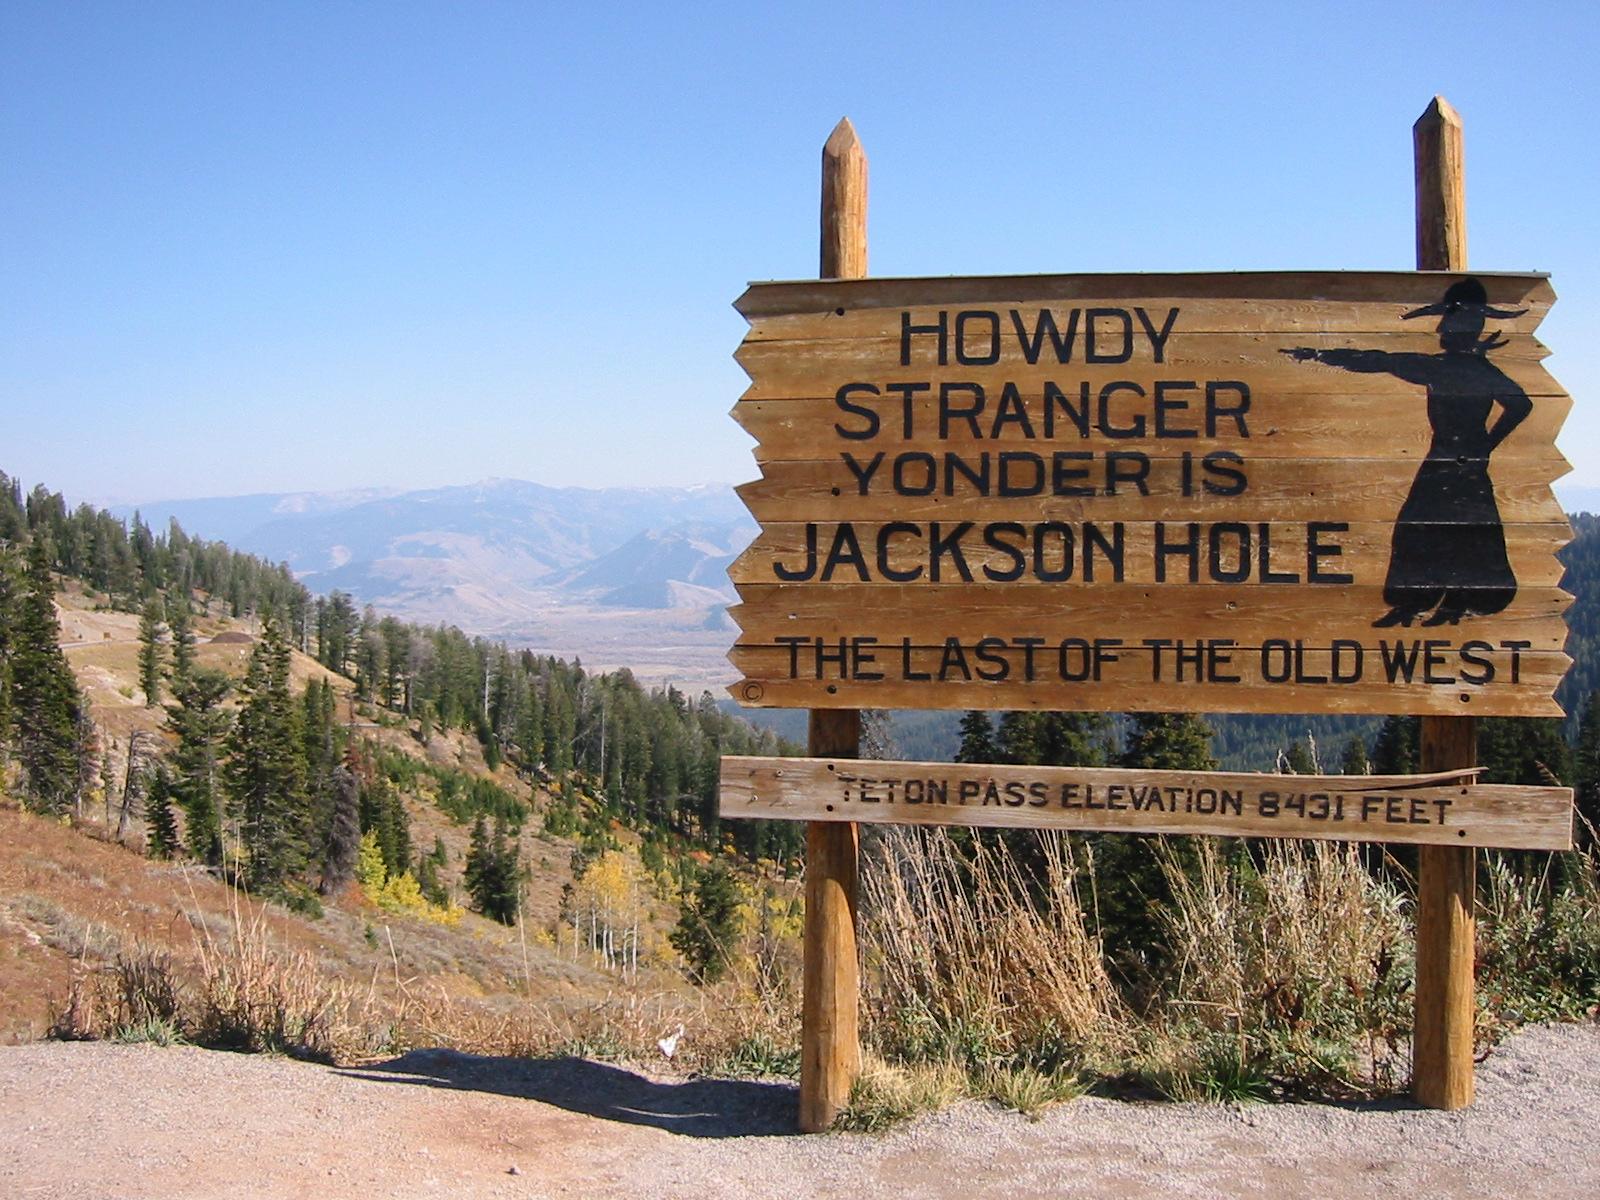 Yonder_Lies_Jackson_Hole.jpg